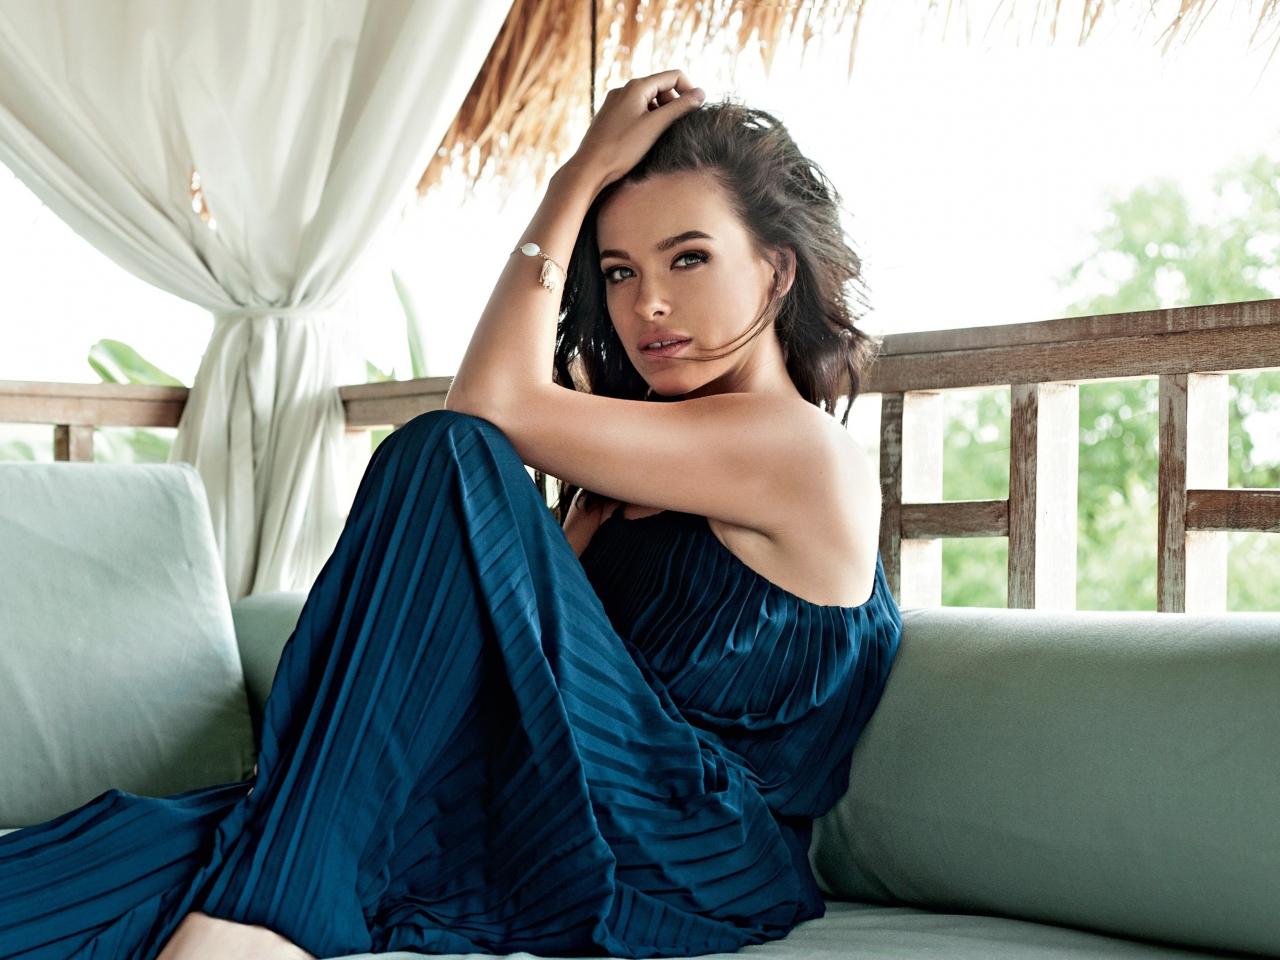 Beautiful, Elena Temnikova, singer, 1280x960 wallpaper